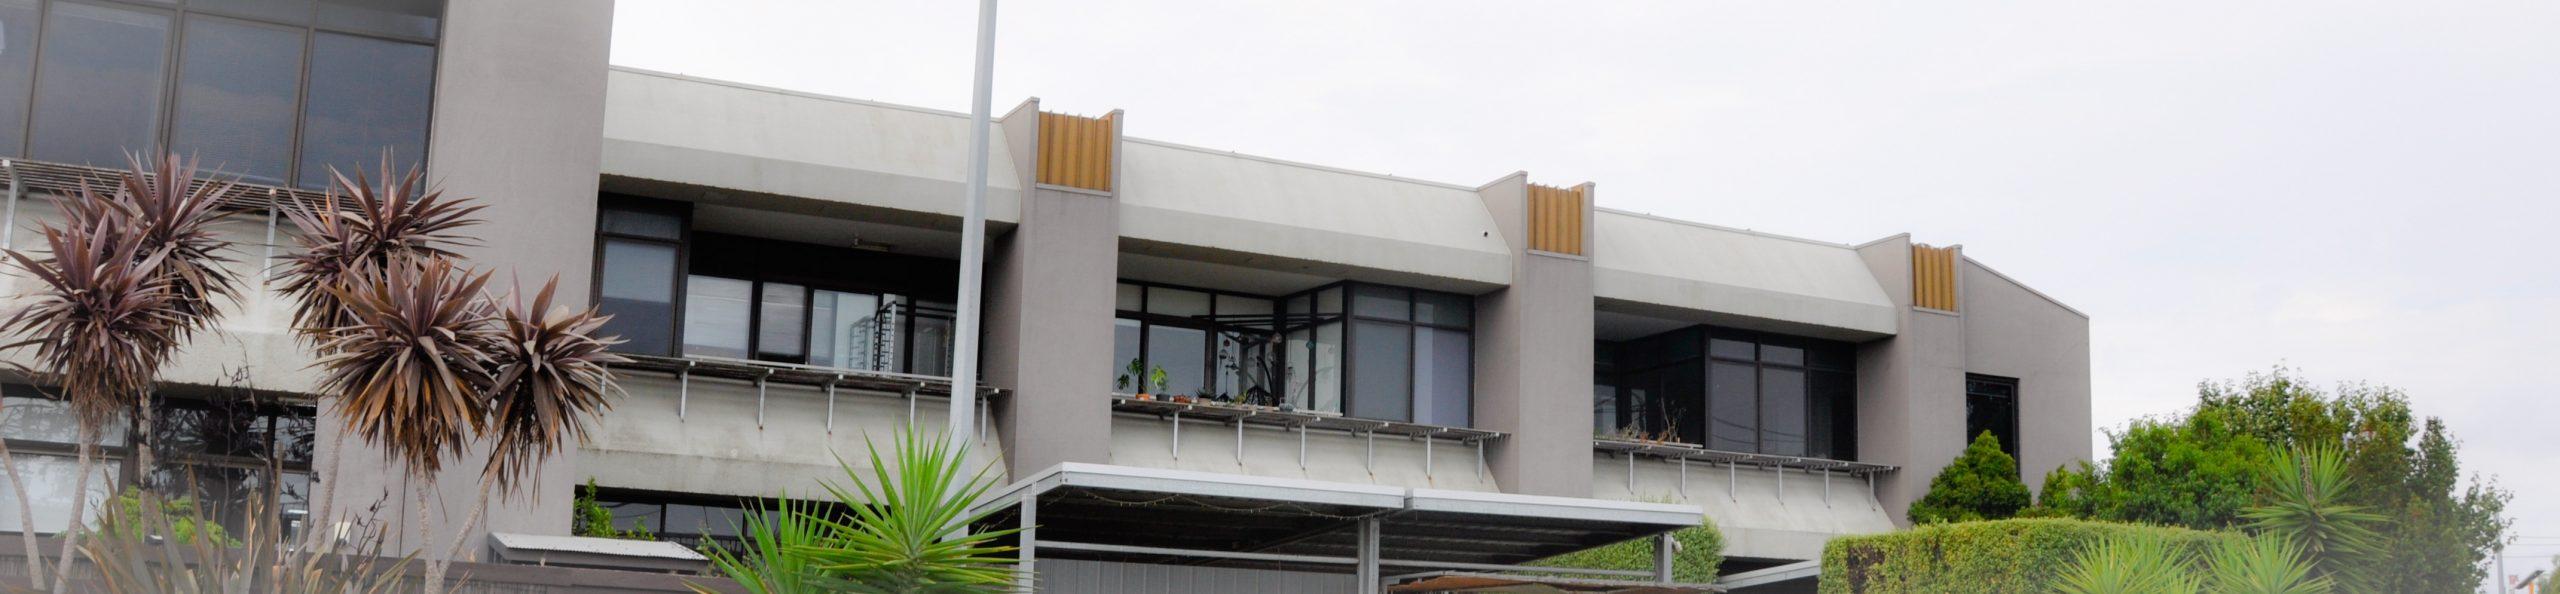 Cristina P. -  Stephen Street, Yarraville, Victoria, 3013